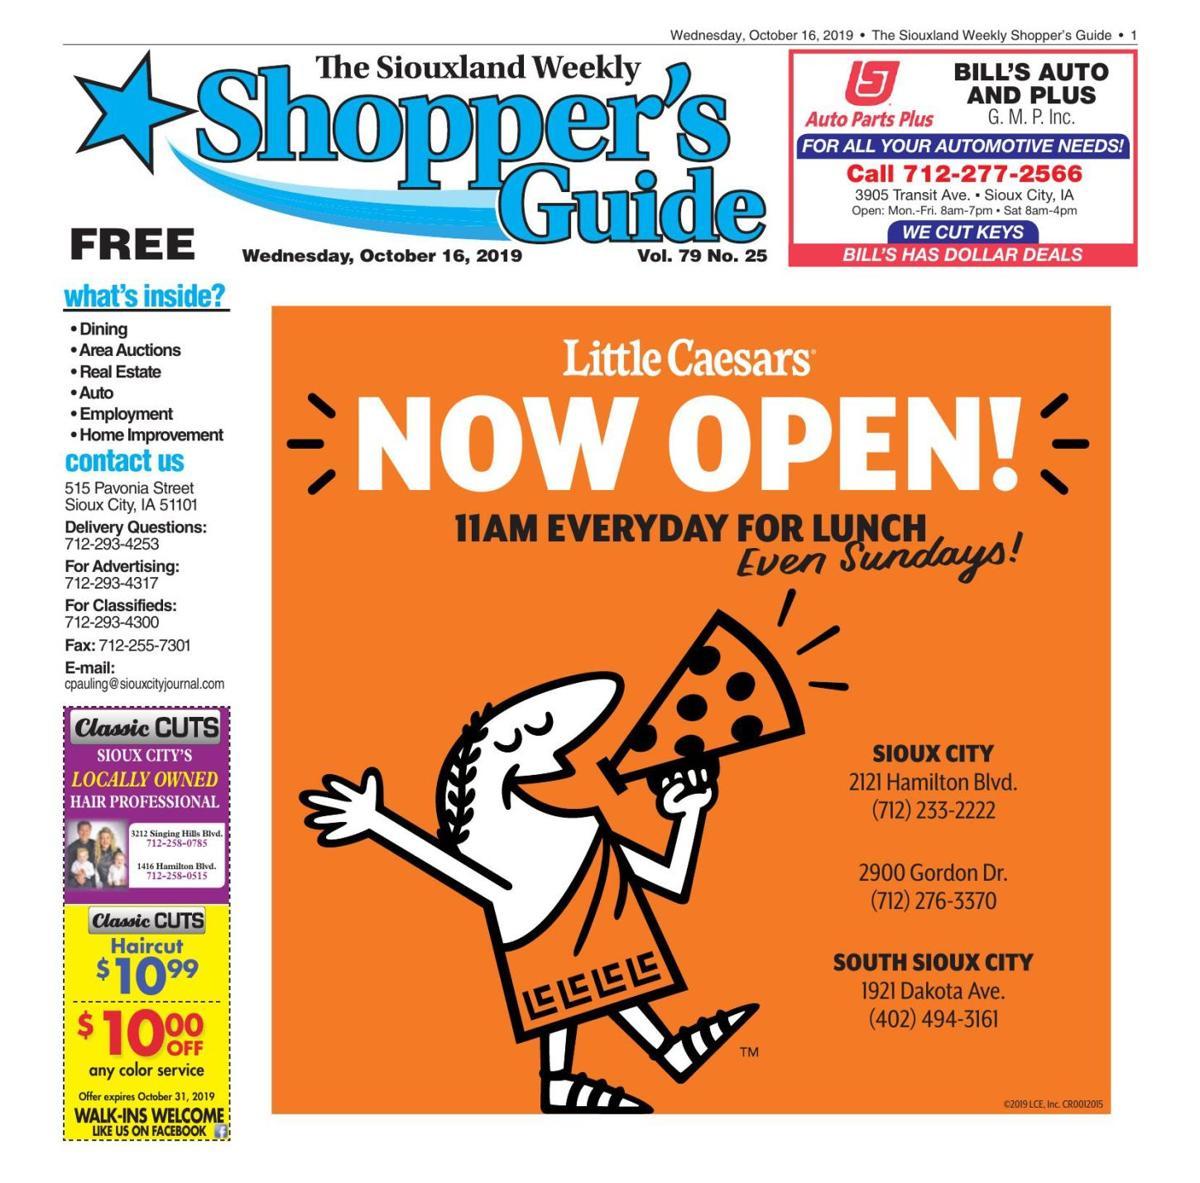 Shopper's Guide - October 16, 2019